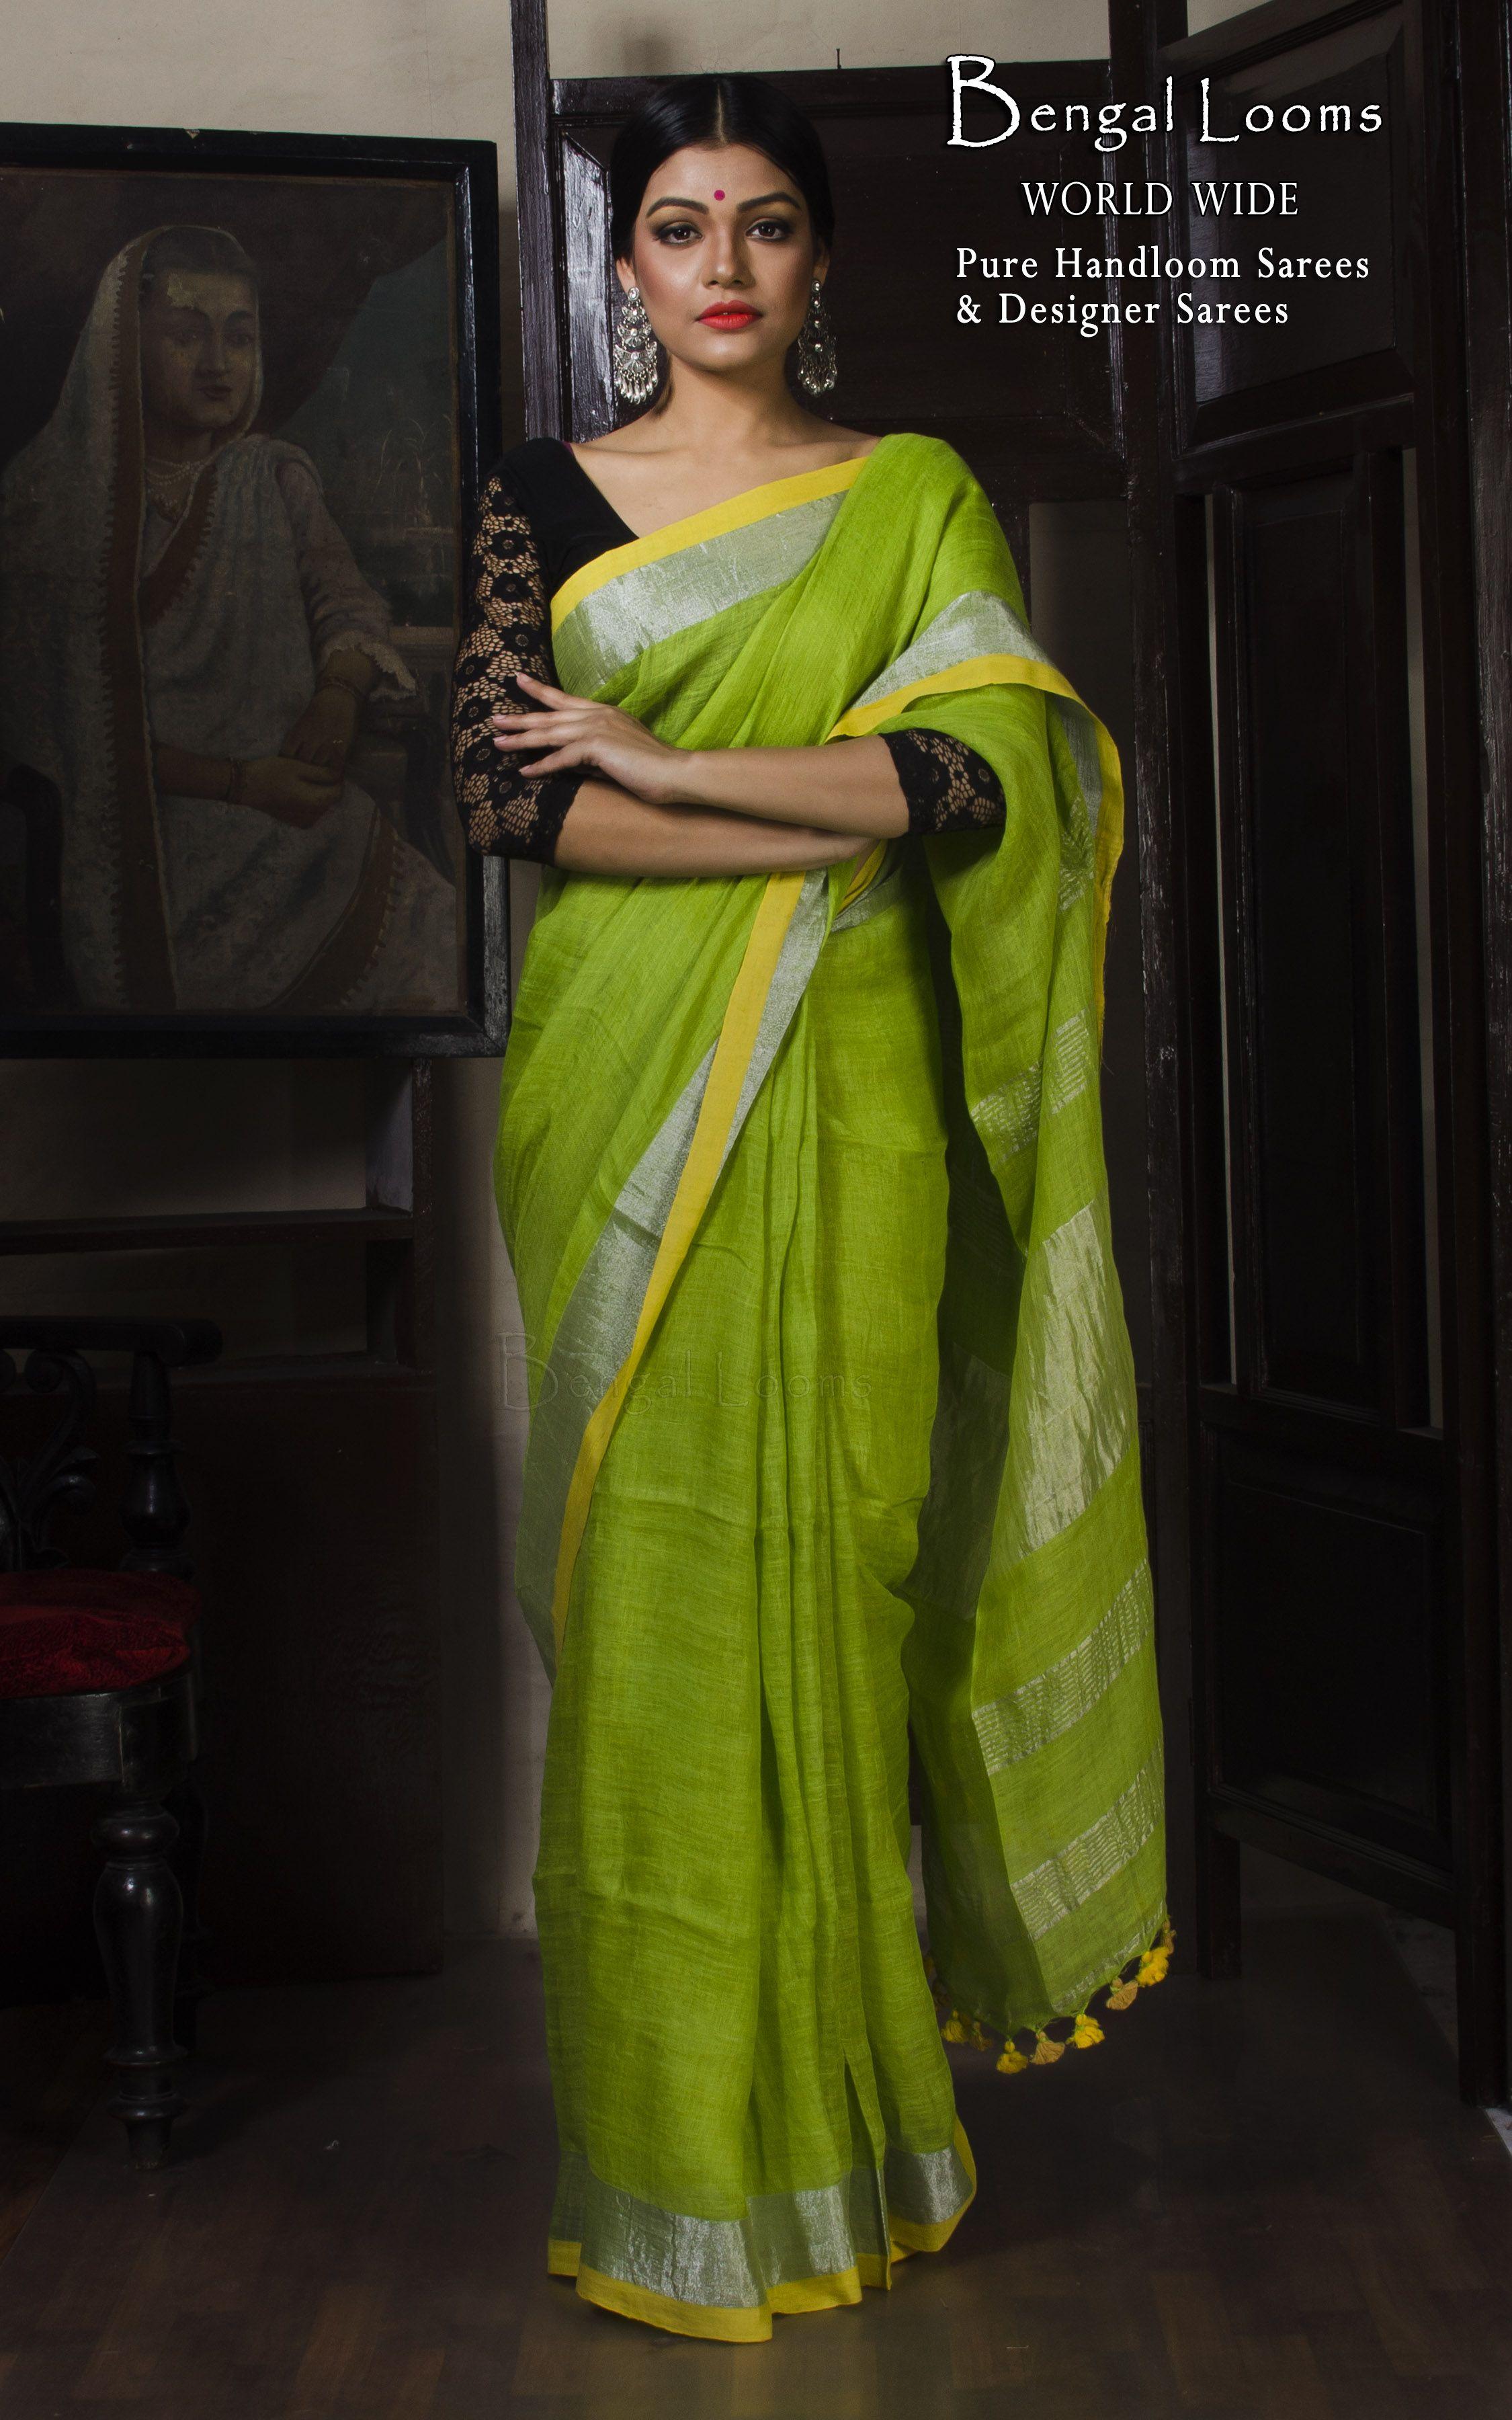 072eba9fa17cea Linen Saree With Silver Zari Border and in Lime Green Color | Linen ...